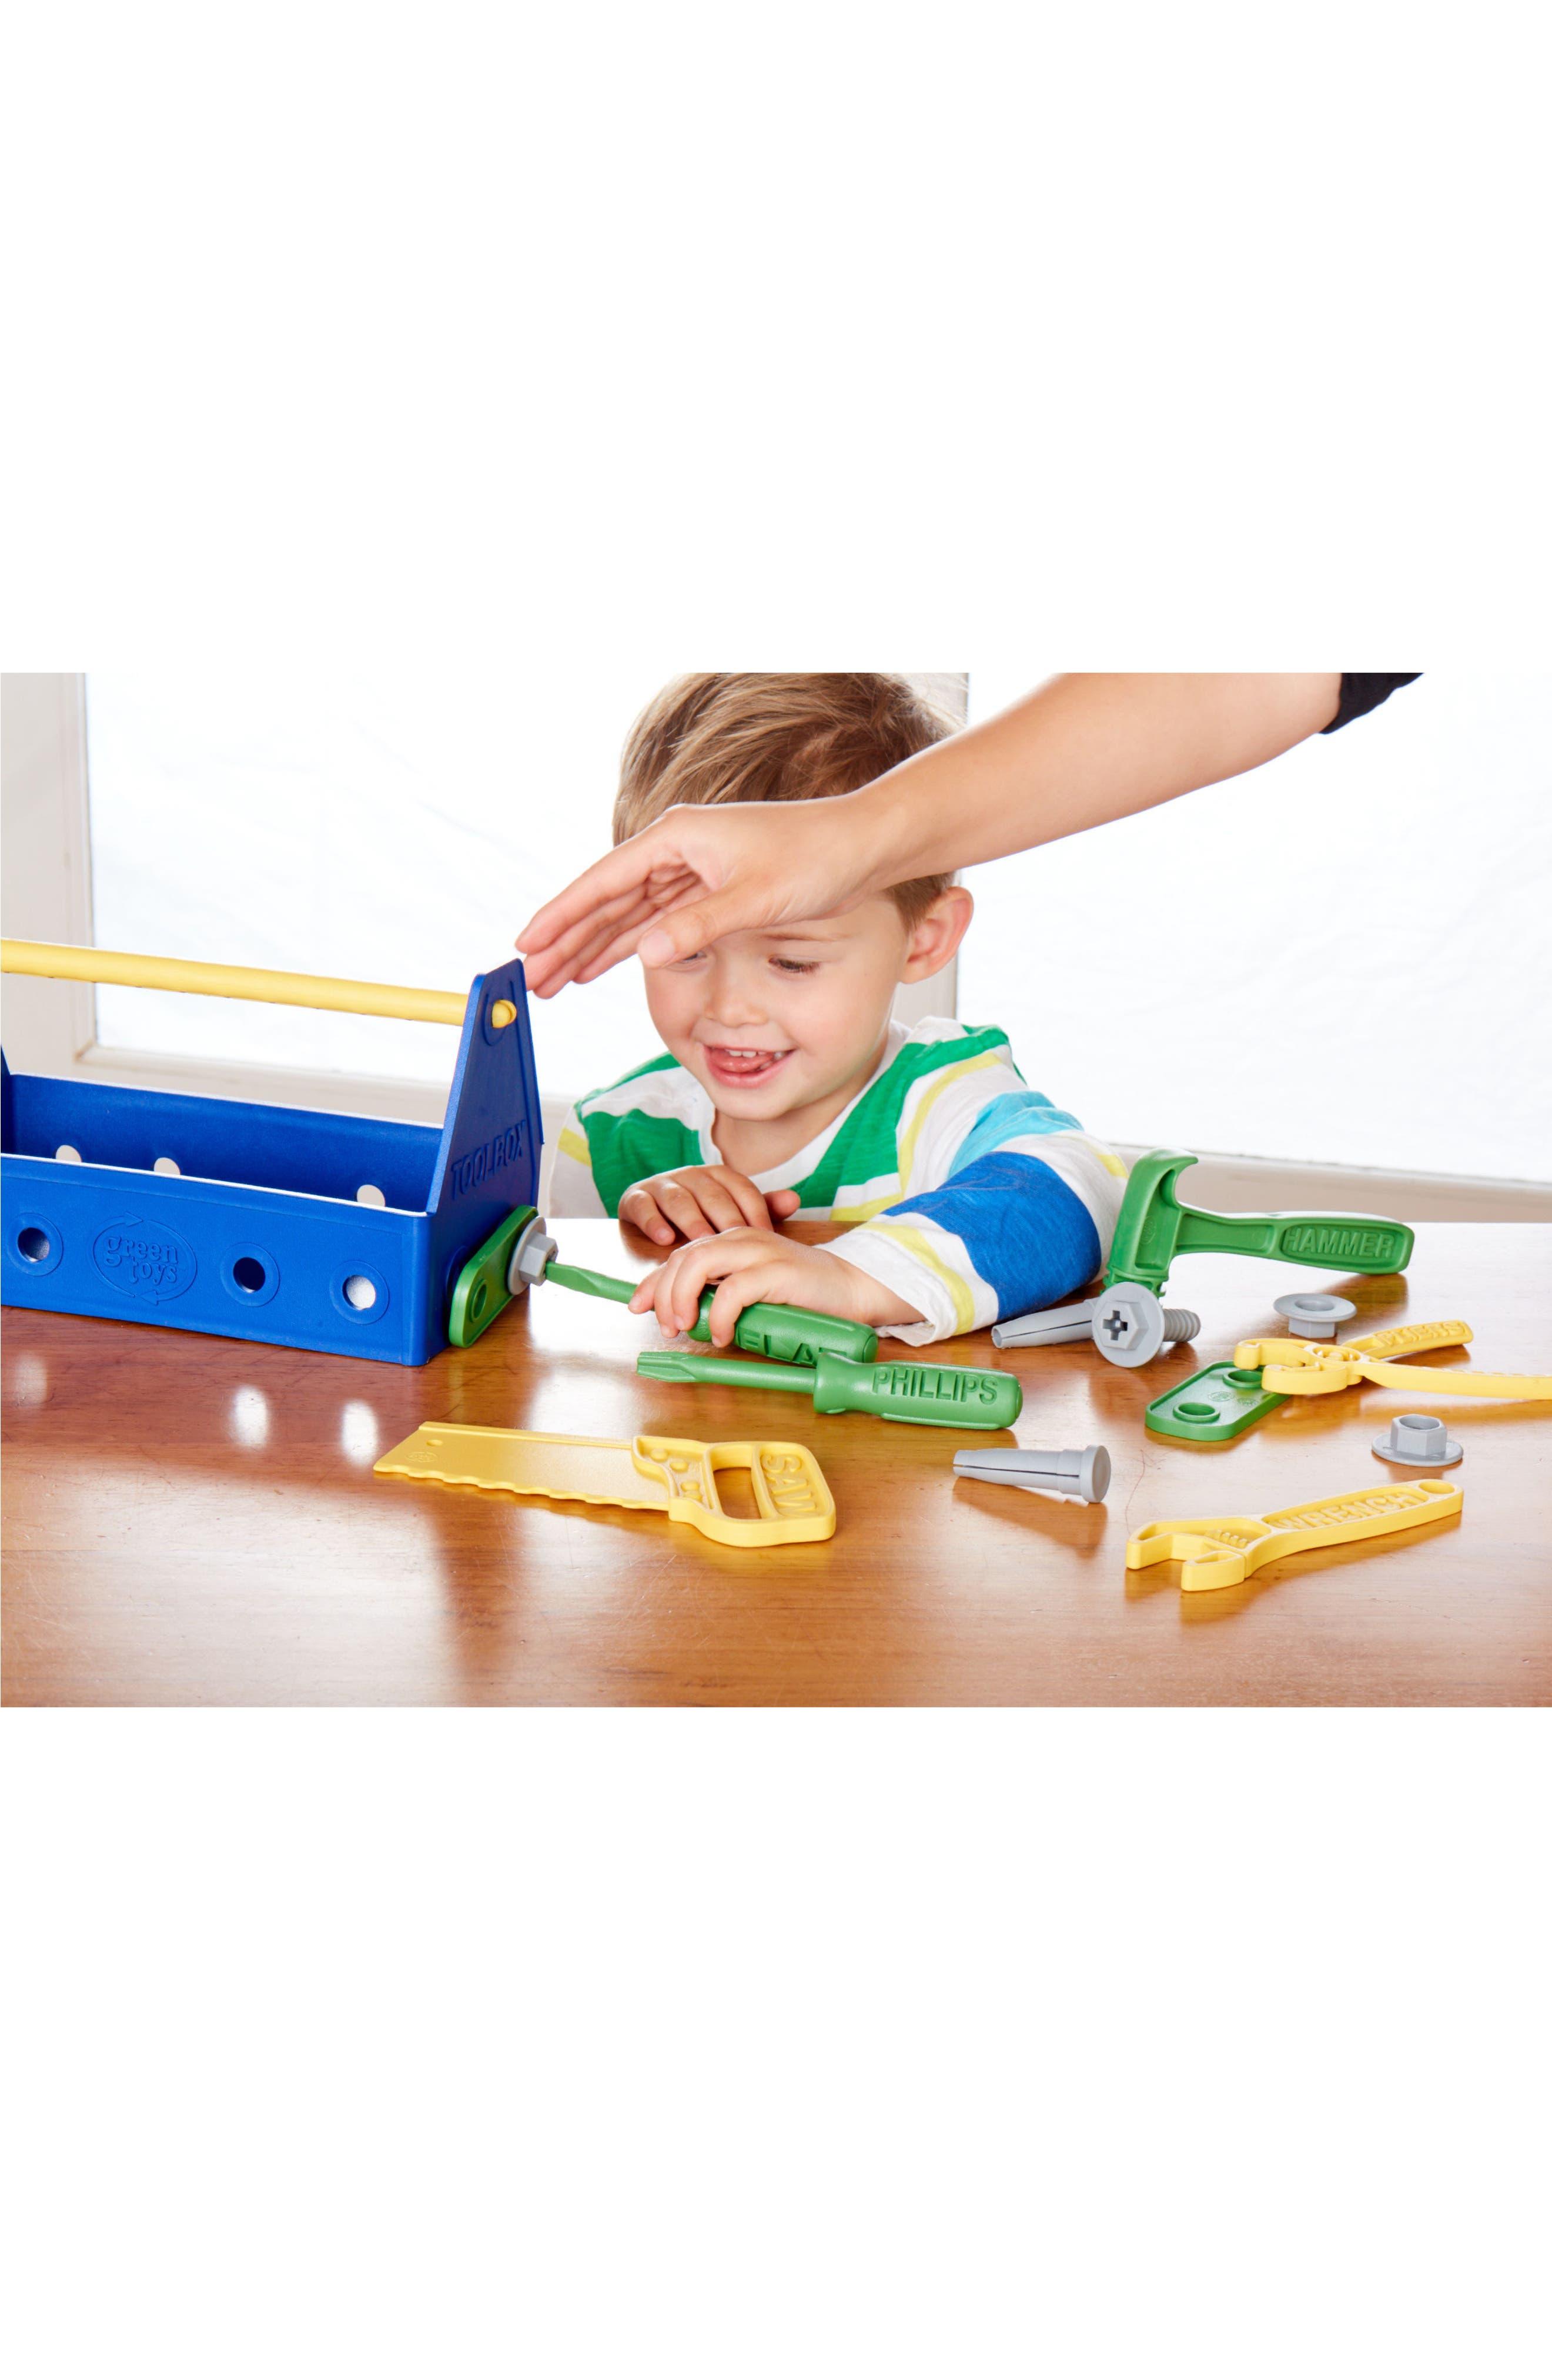 15-Piece Plastic Tool Set,                             Alternate thumbnail 4, color,                             Blue